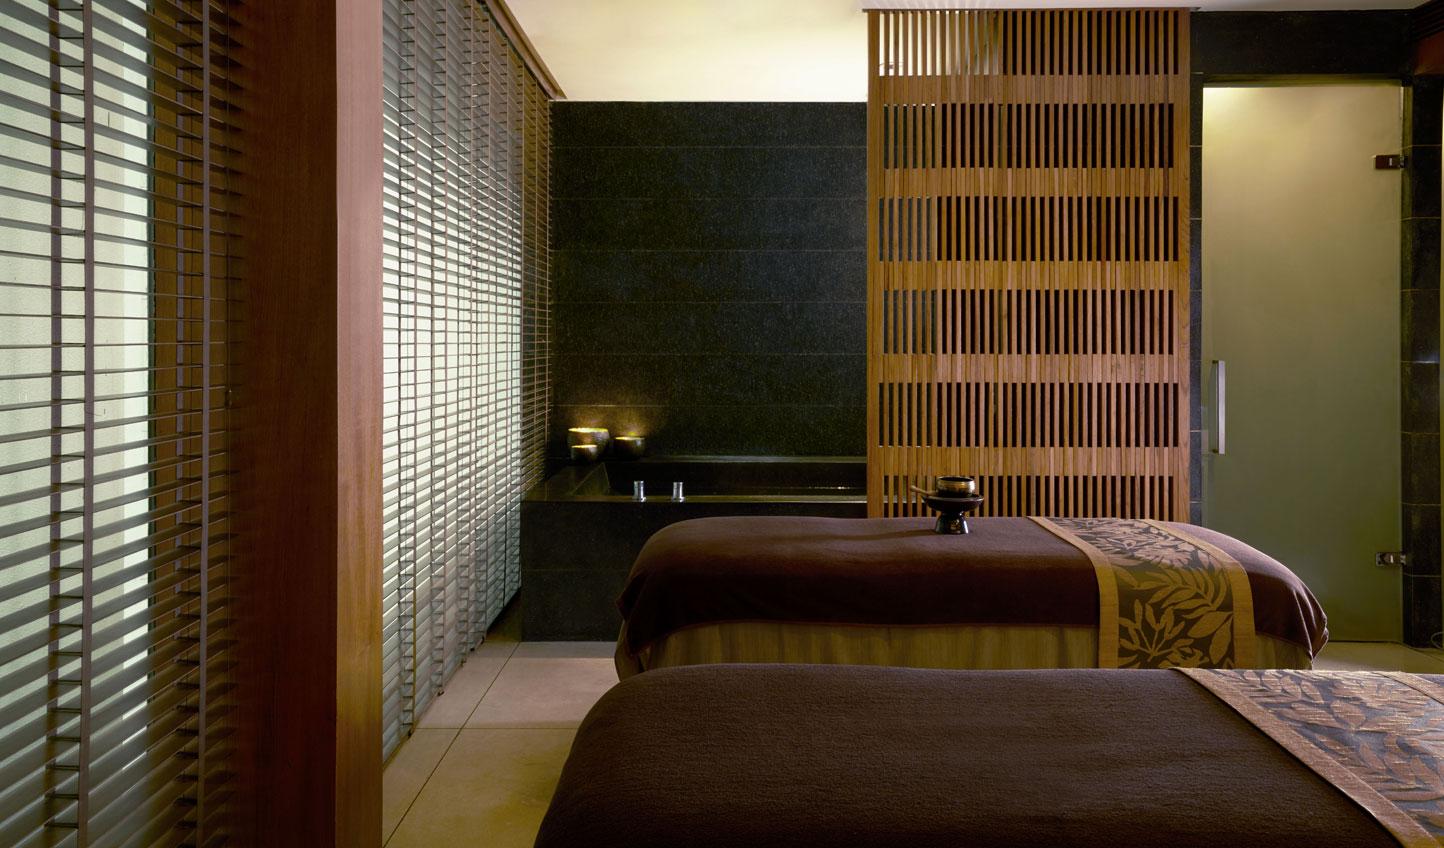 The sense empowering spa